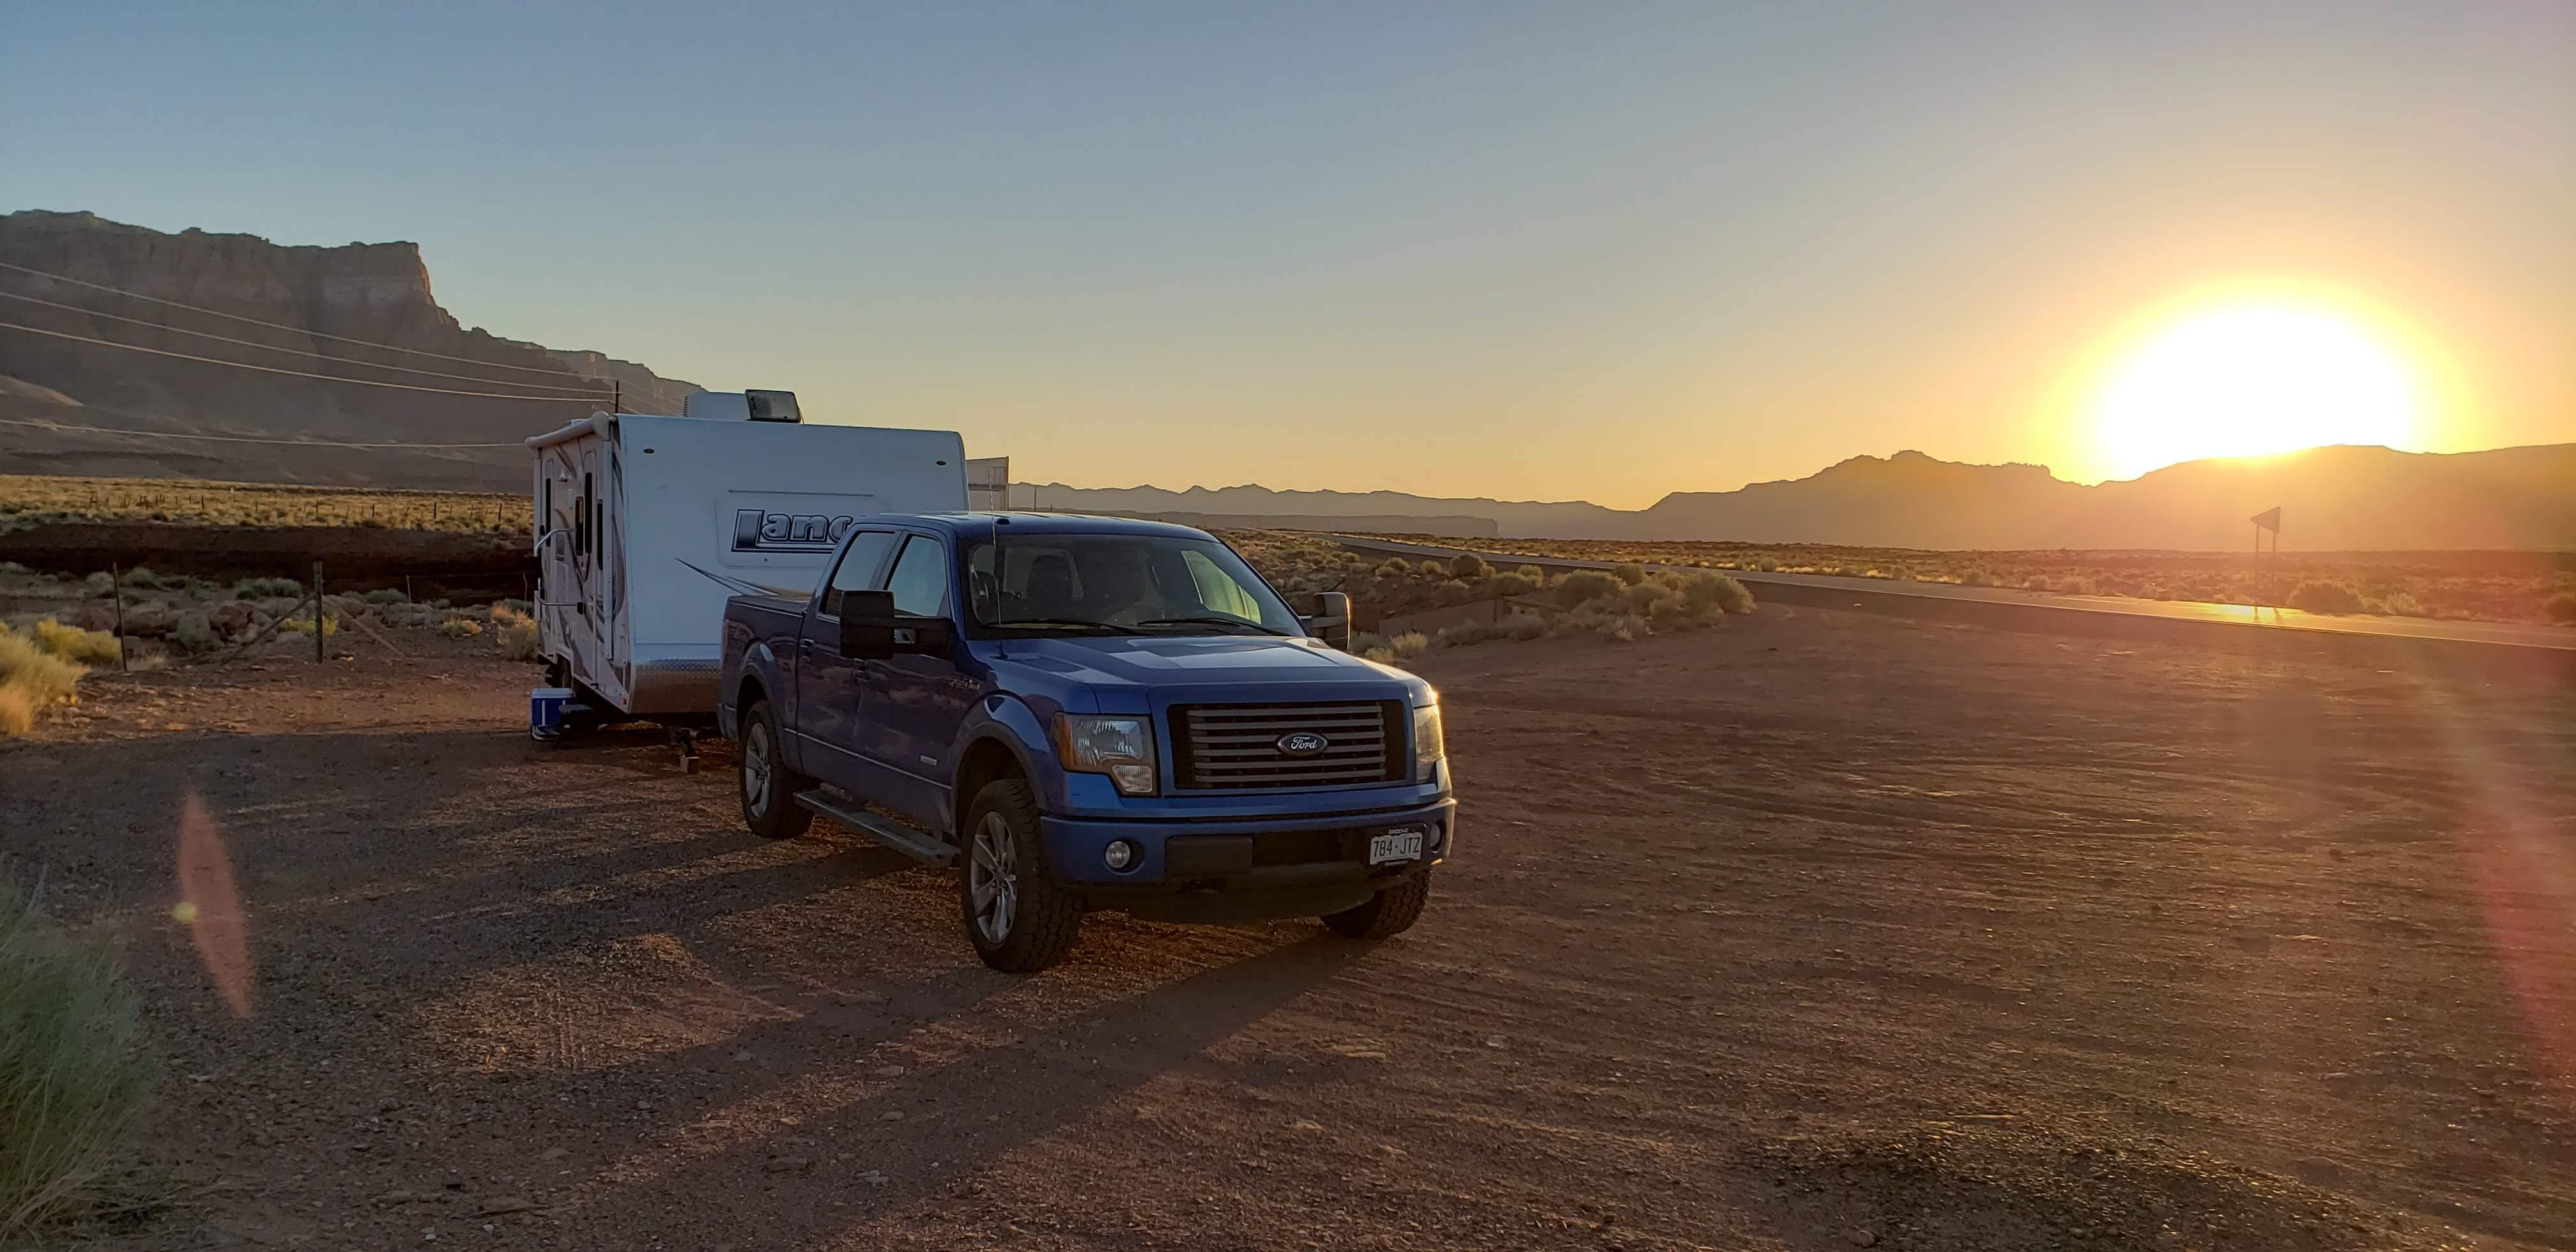 Dry camping in AZ. Lance 2185 2014